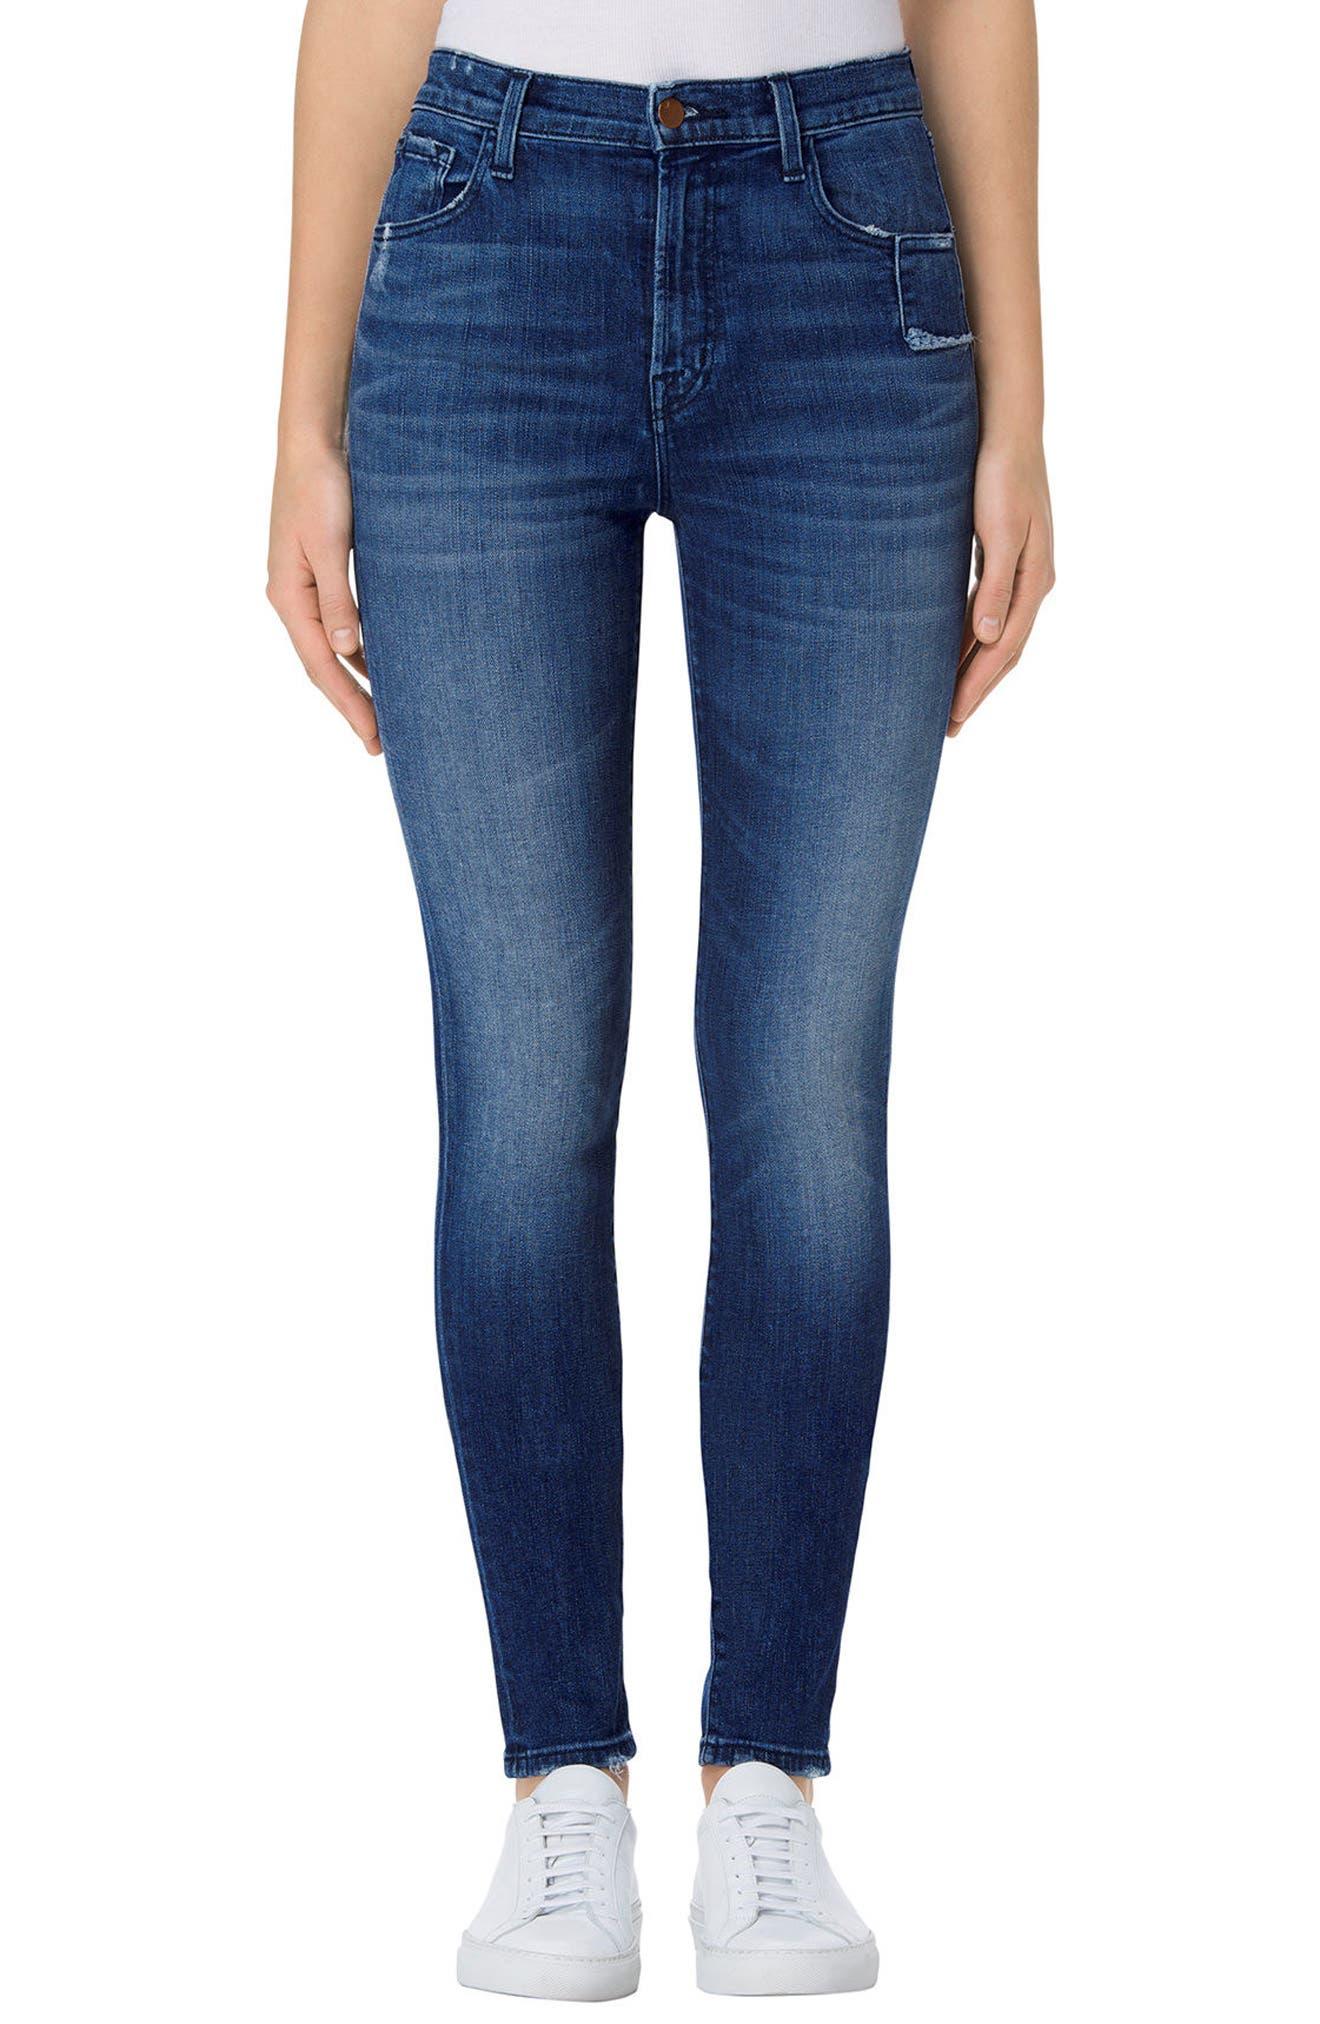 Alternate Image 1 Selected - J Brand Carolina Super High Rise Skinny Jeans (Gone)